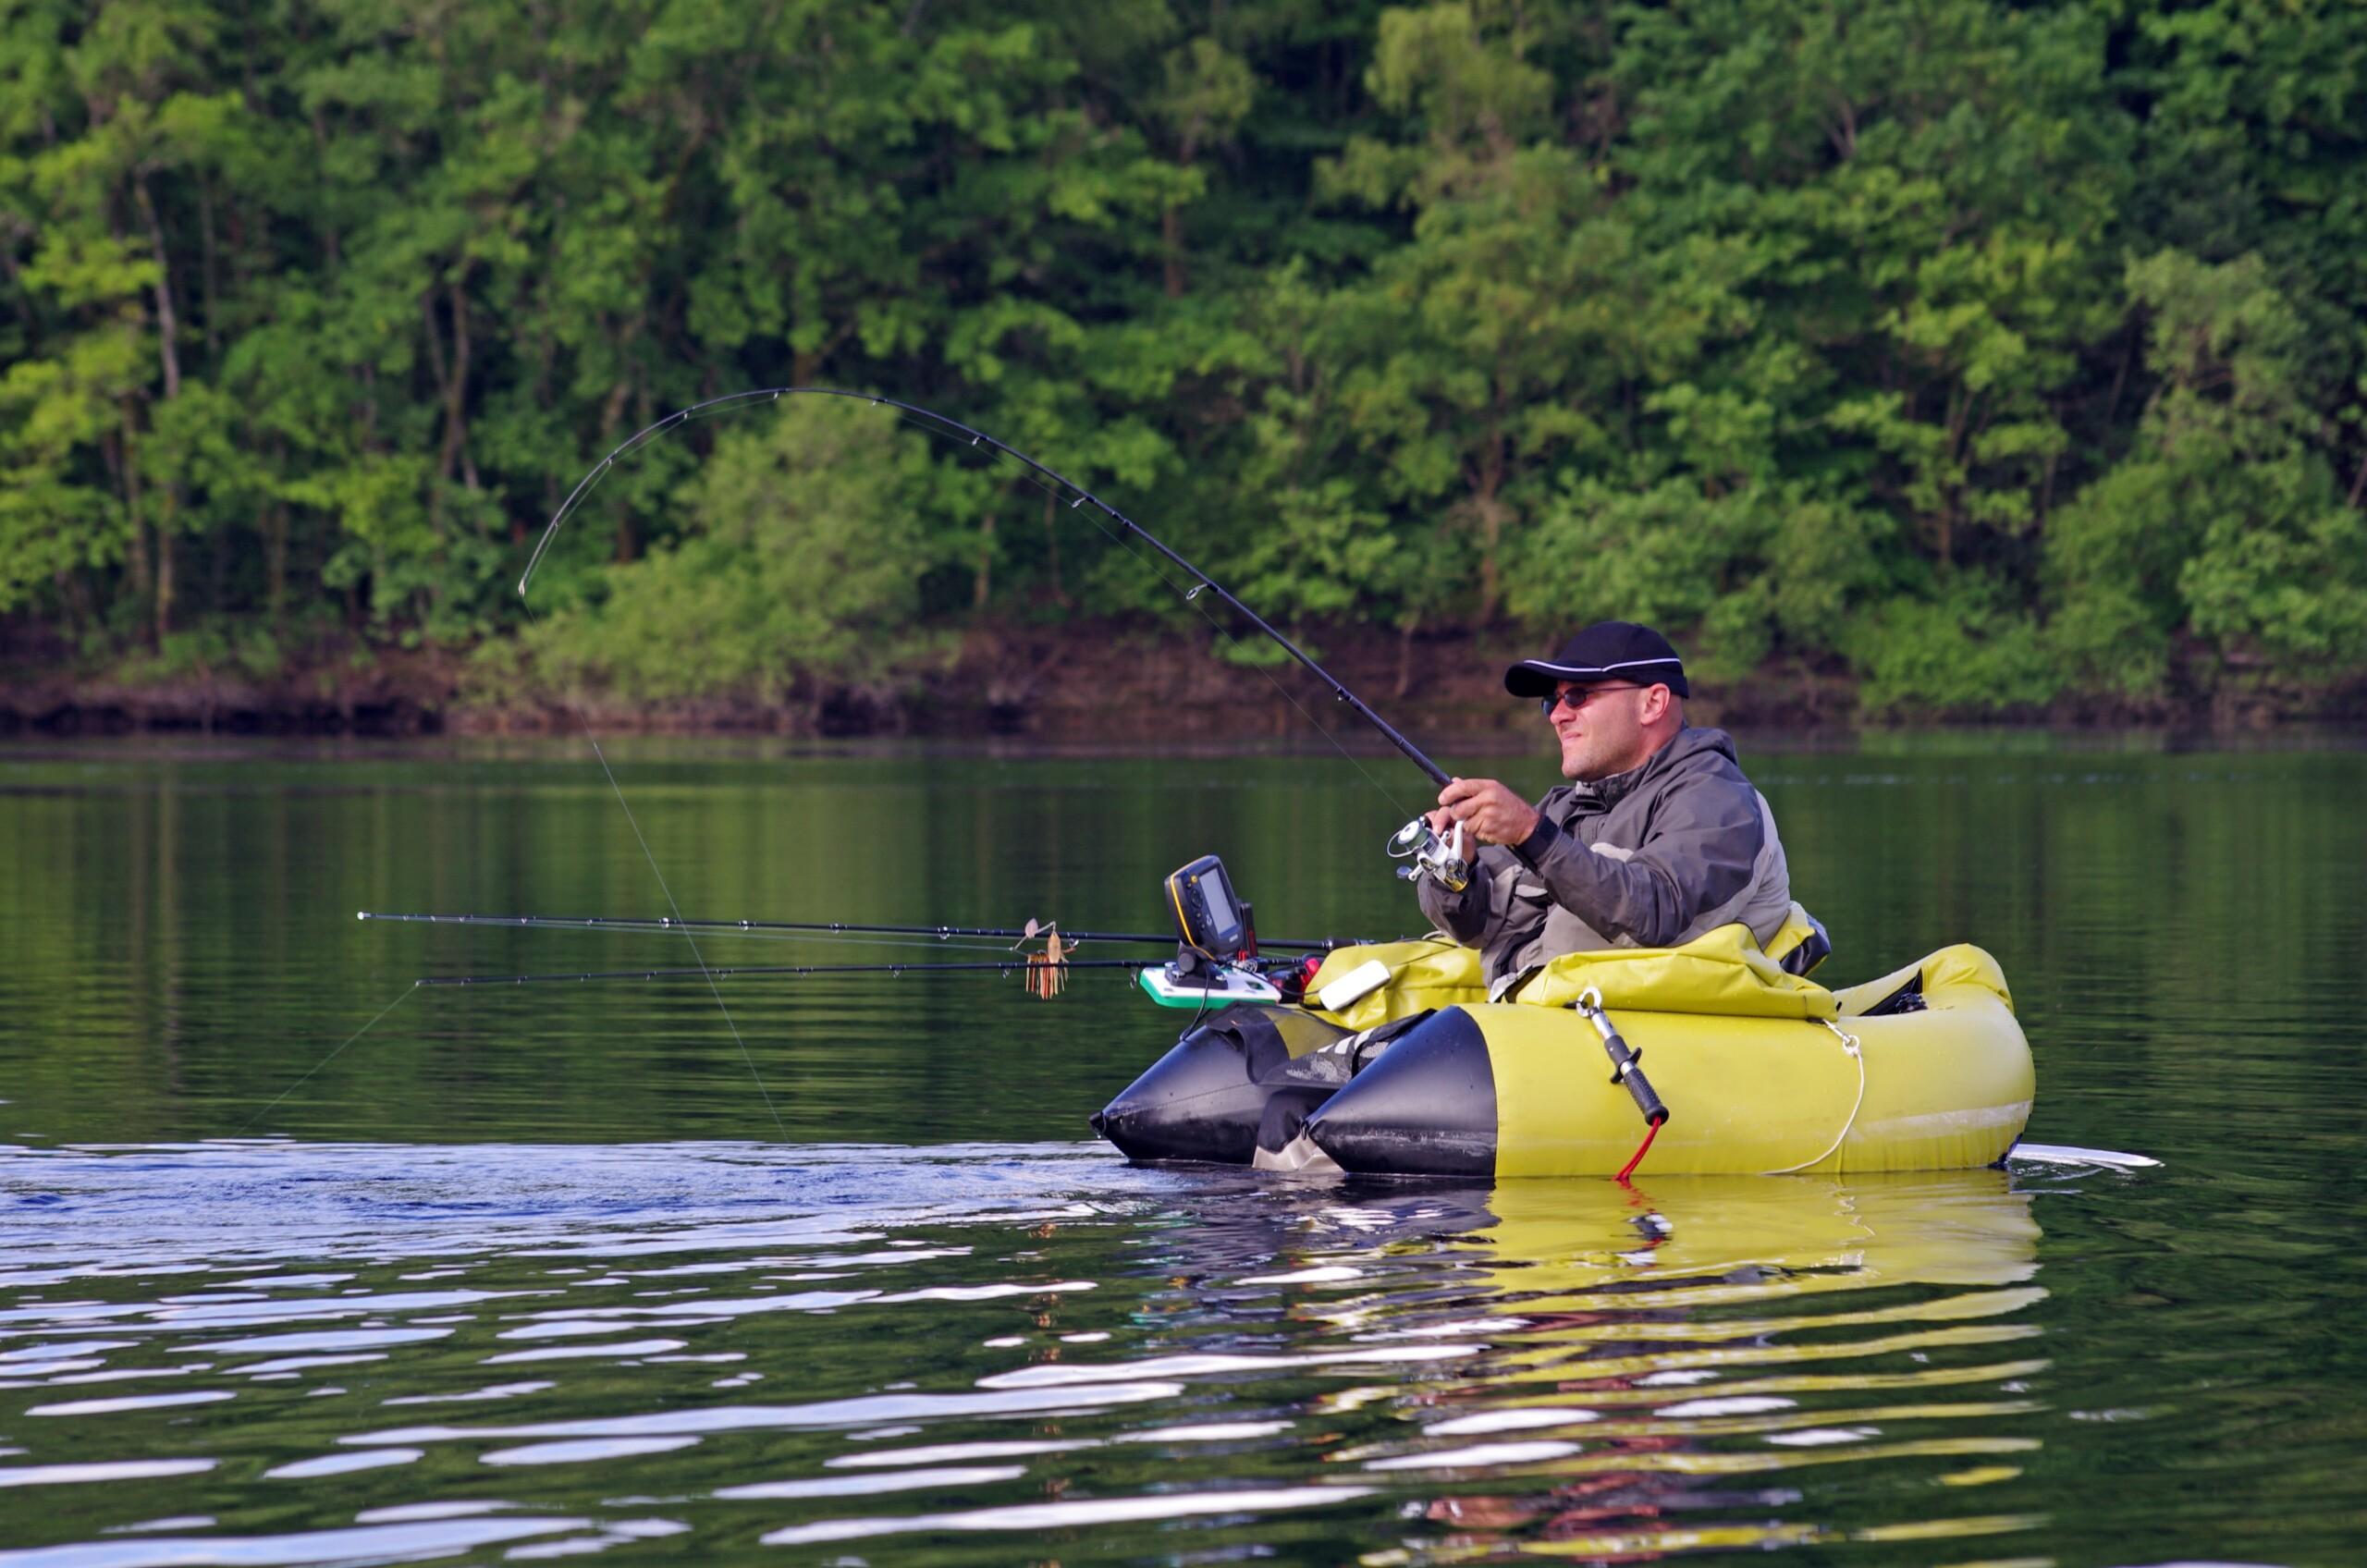 Kayak Inflatable Stabilizer Boat Balance Pontoon Float Tube and Mount Pole Rack